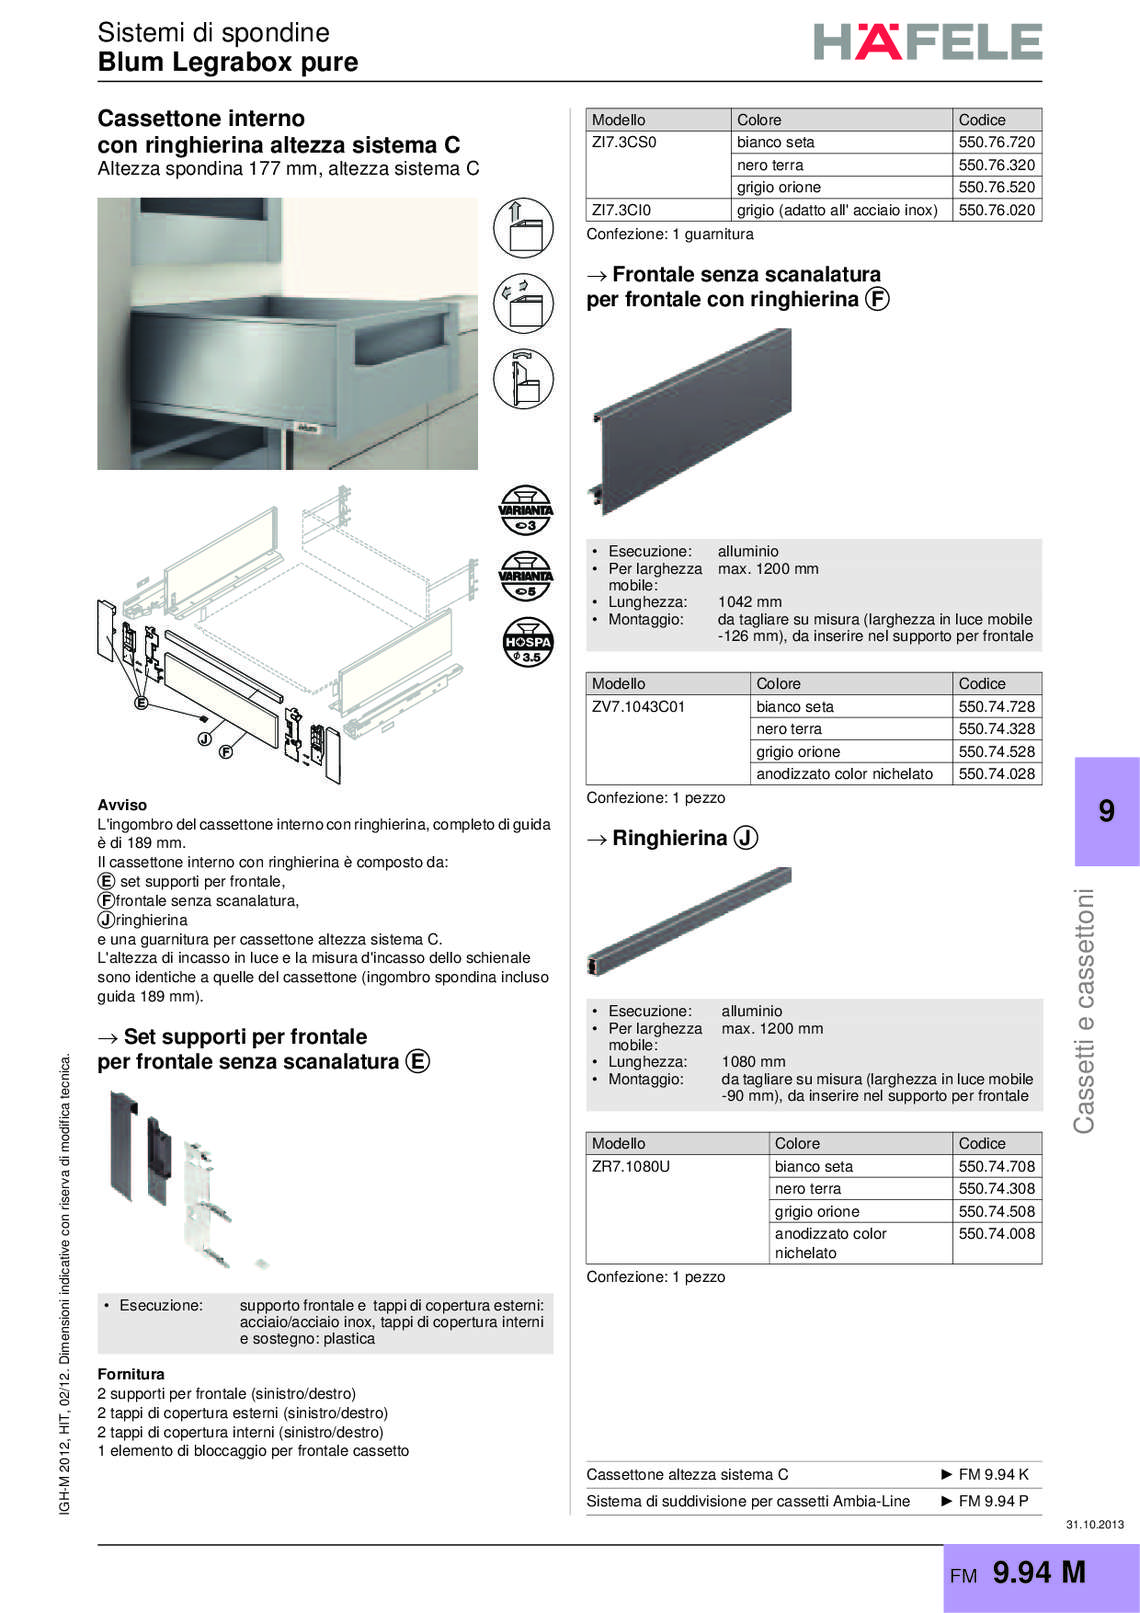 hafele-spondine-e-guide-per-mobili_40_130.jpg